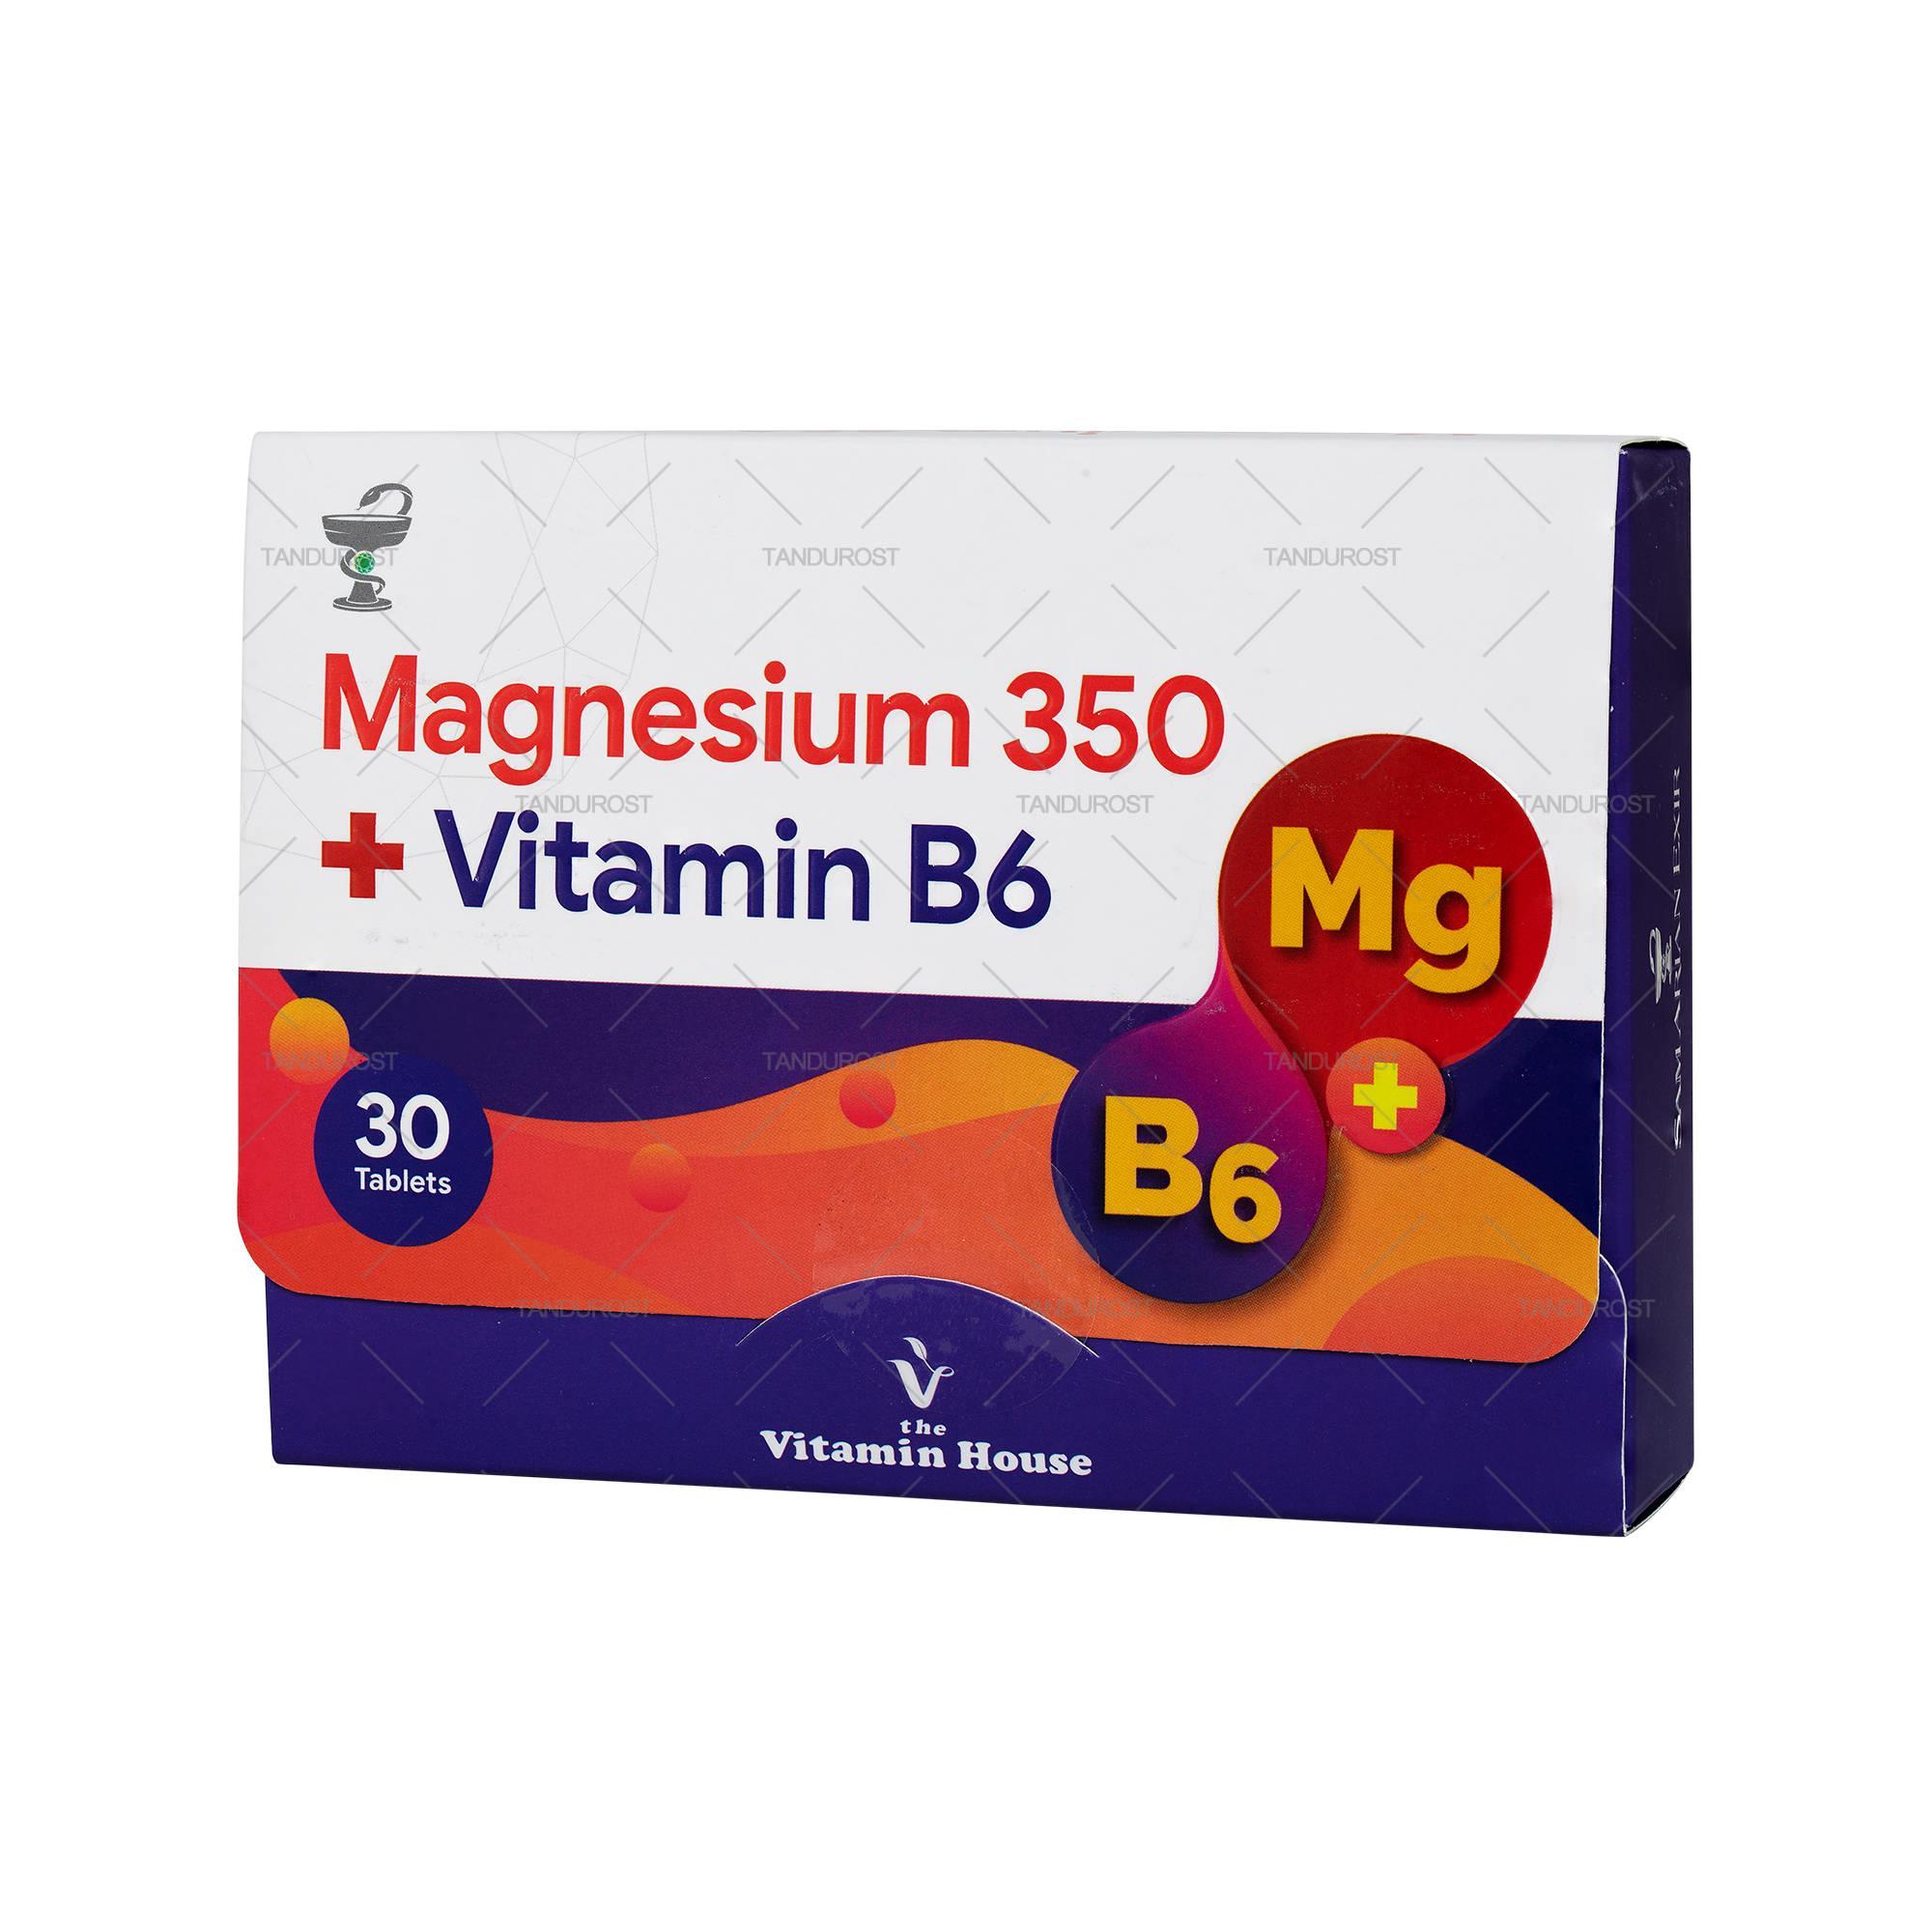 منیزیم ویتامین B6 ویتامین هاوس